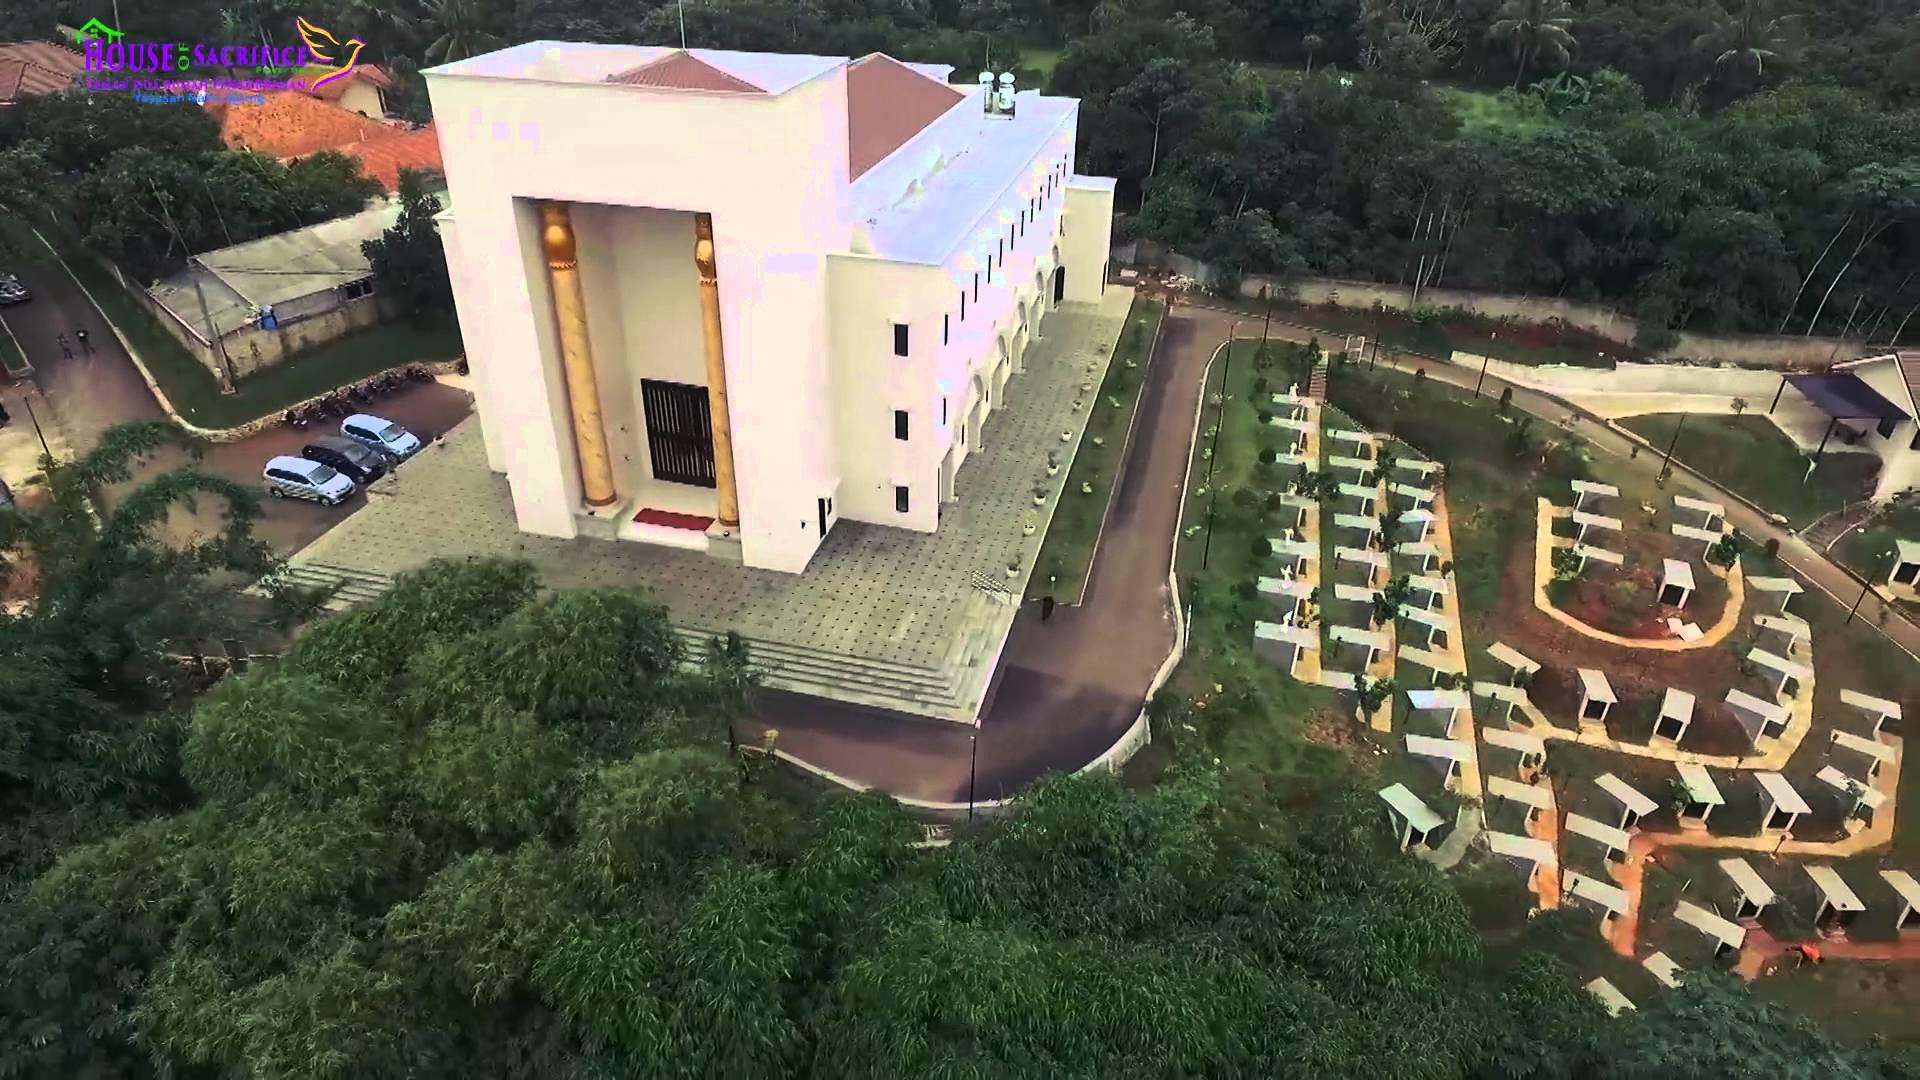 House Sacrifice Depok Youtube Bukit Doa Karmel Tangkiling Kota Palangkaraya